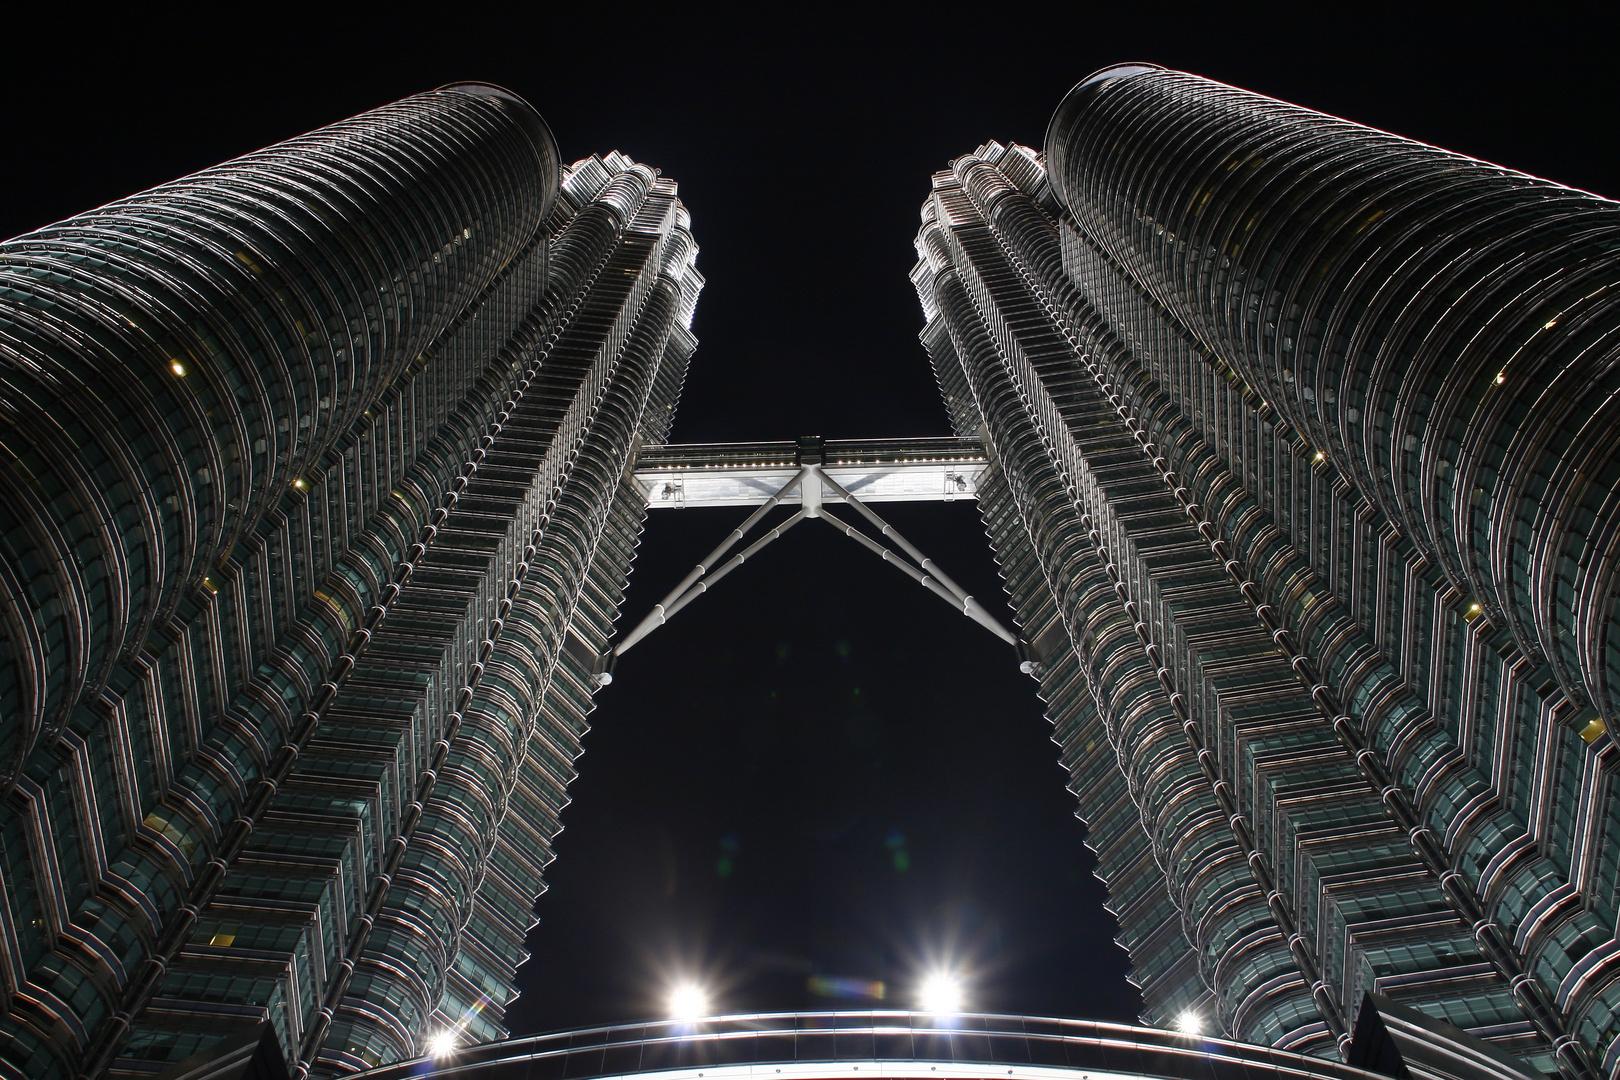 Petronas tower in KL